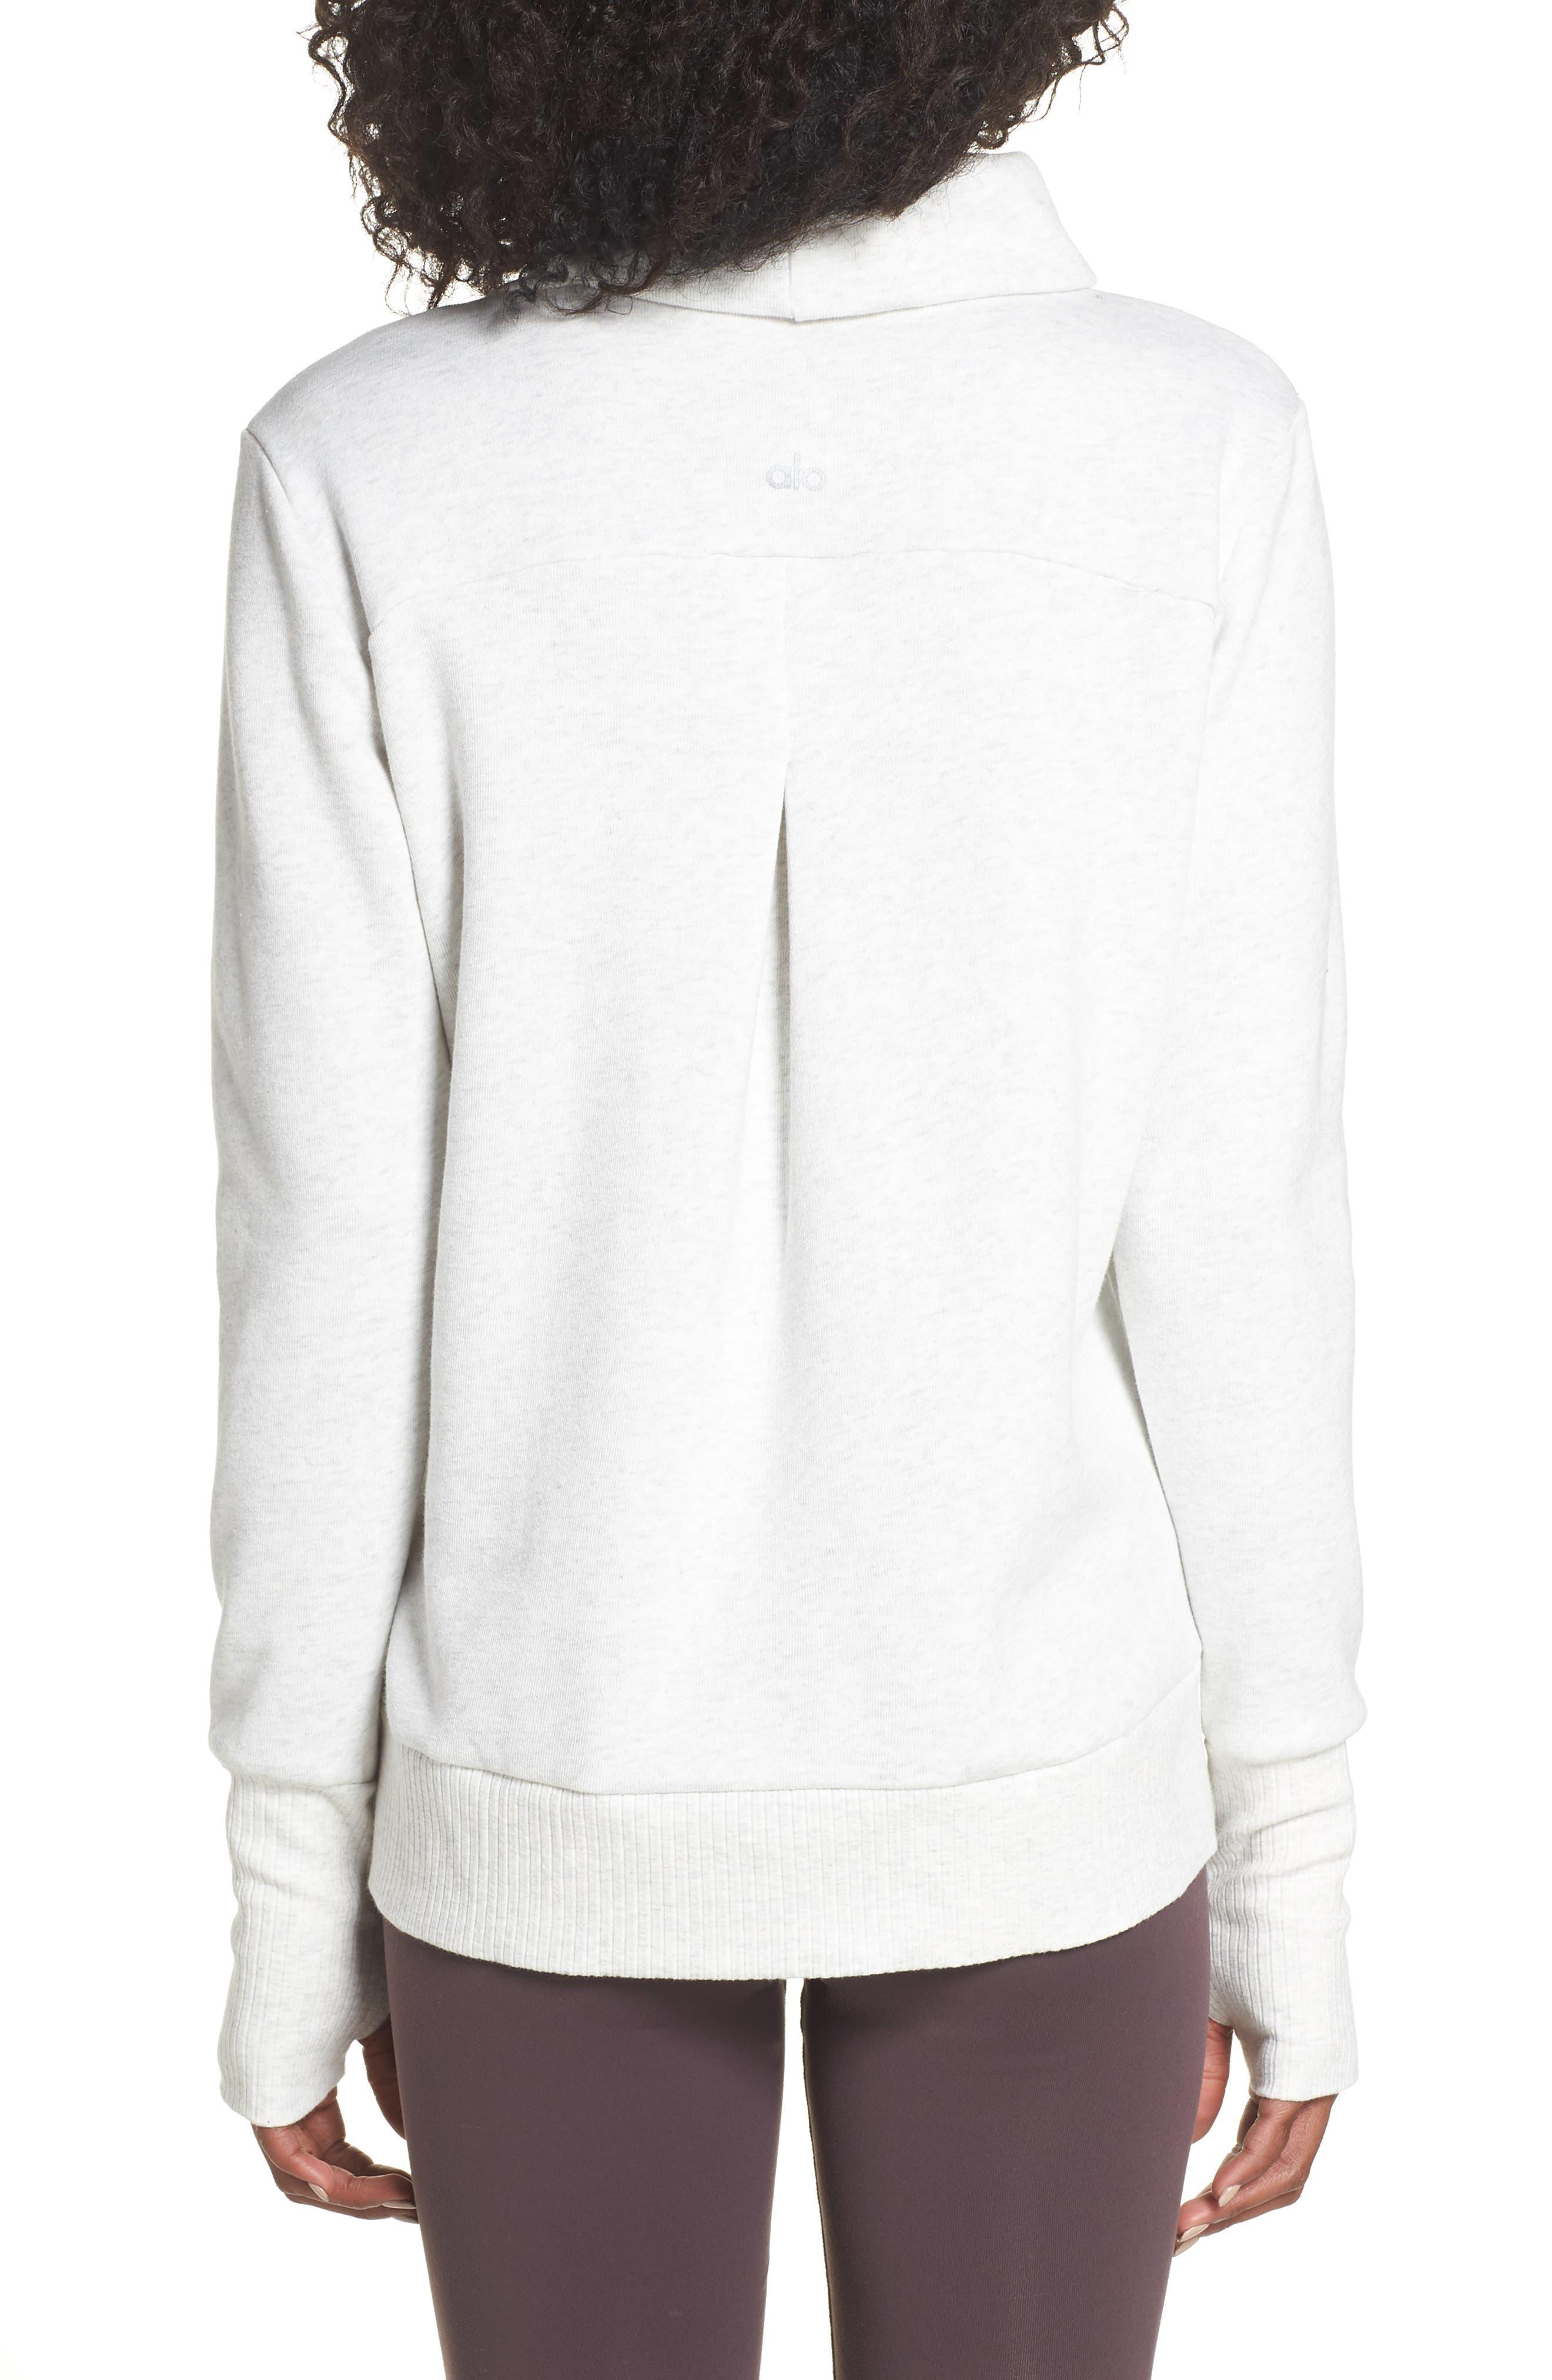 'Haze' Funnel Neck Sweatshirt,                             Alternate thumbnail 2, color,                             WHITE HEATHER